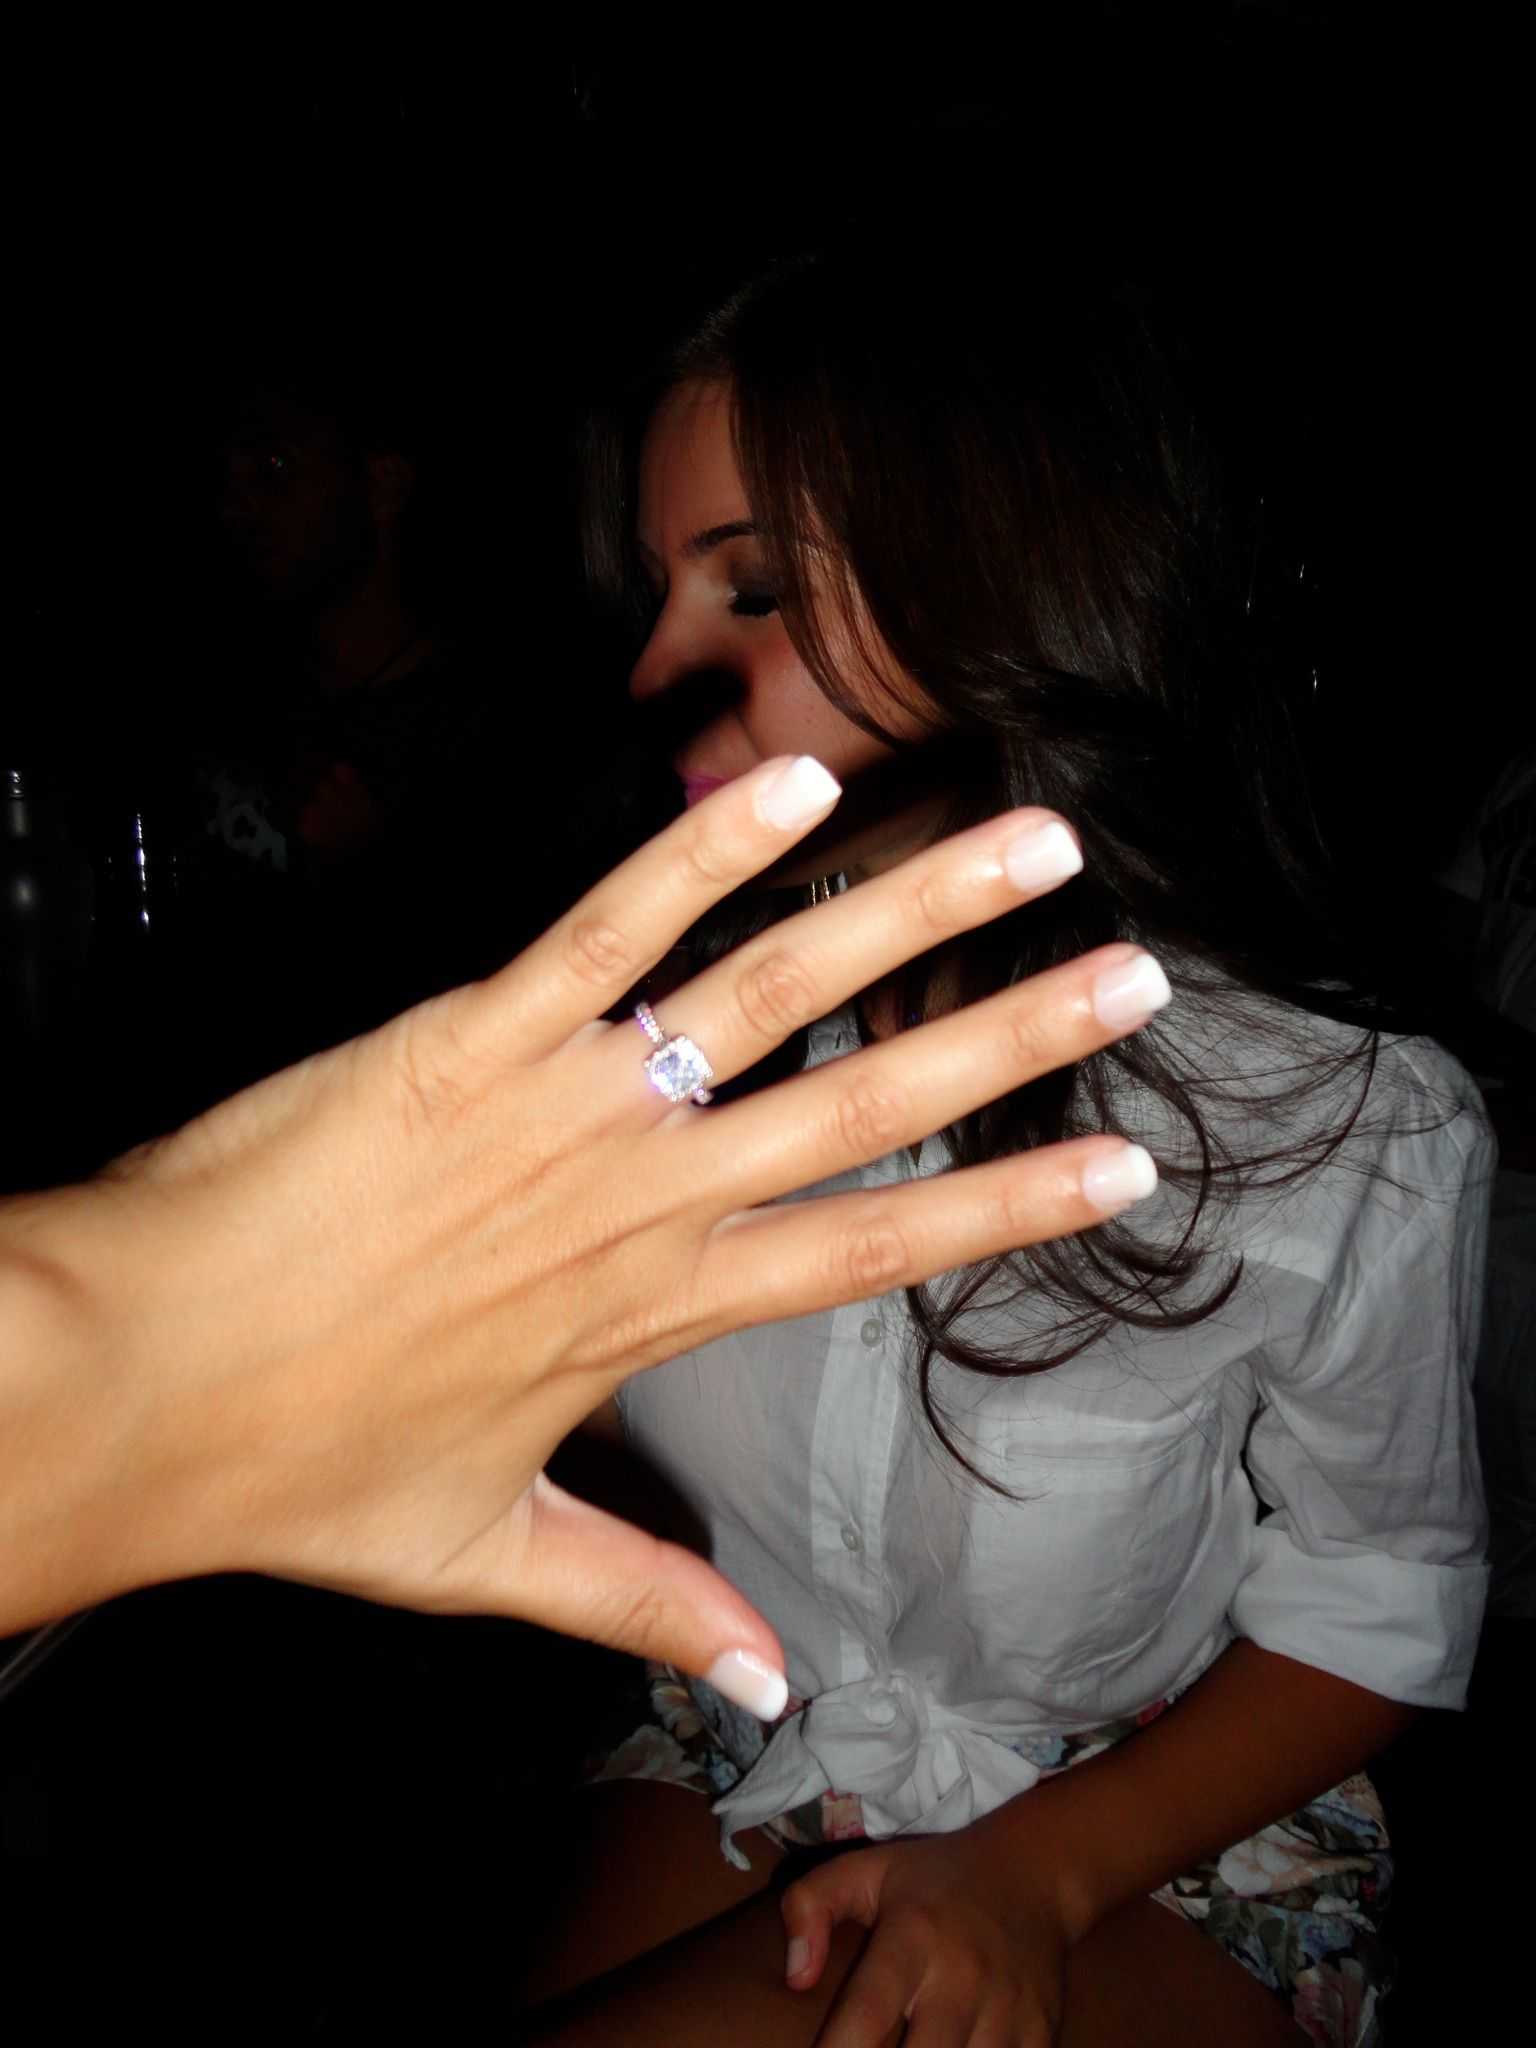 Tacori Engagement Ring 1 2 carat cushion cut VVS clarity and D